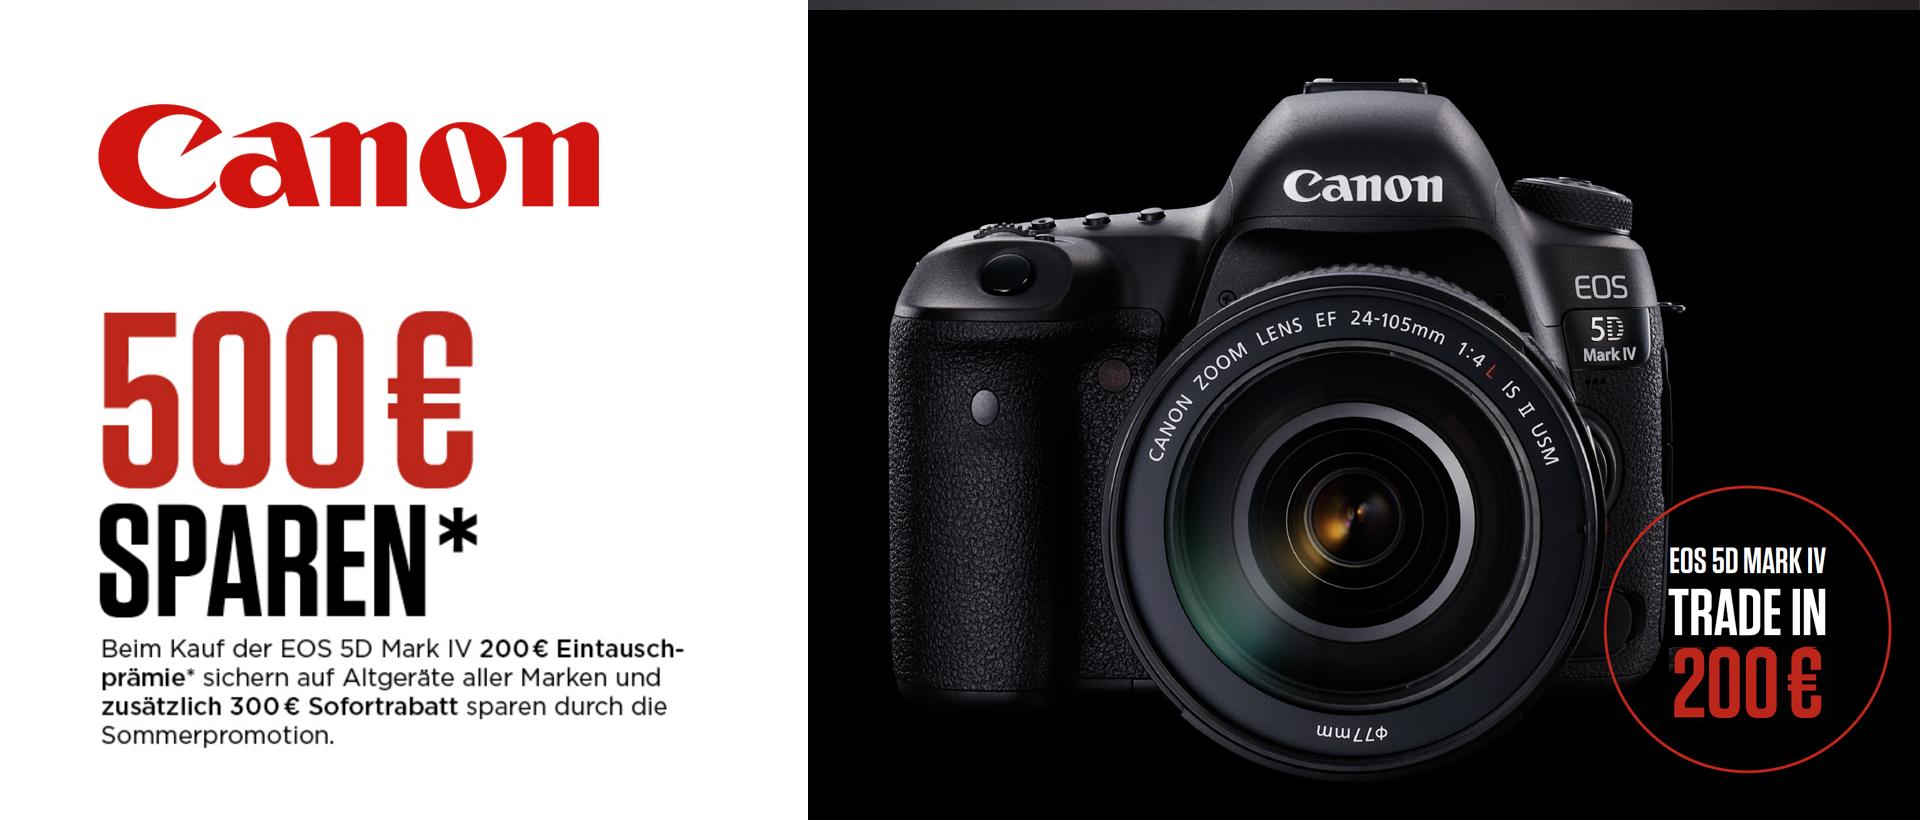 Canon EOS 5D IV Trade-In